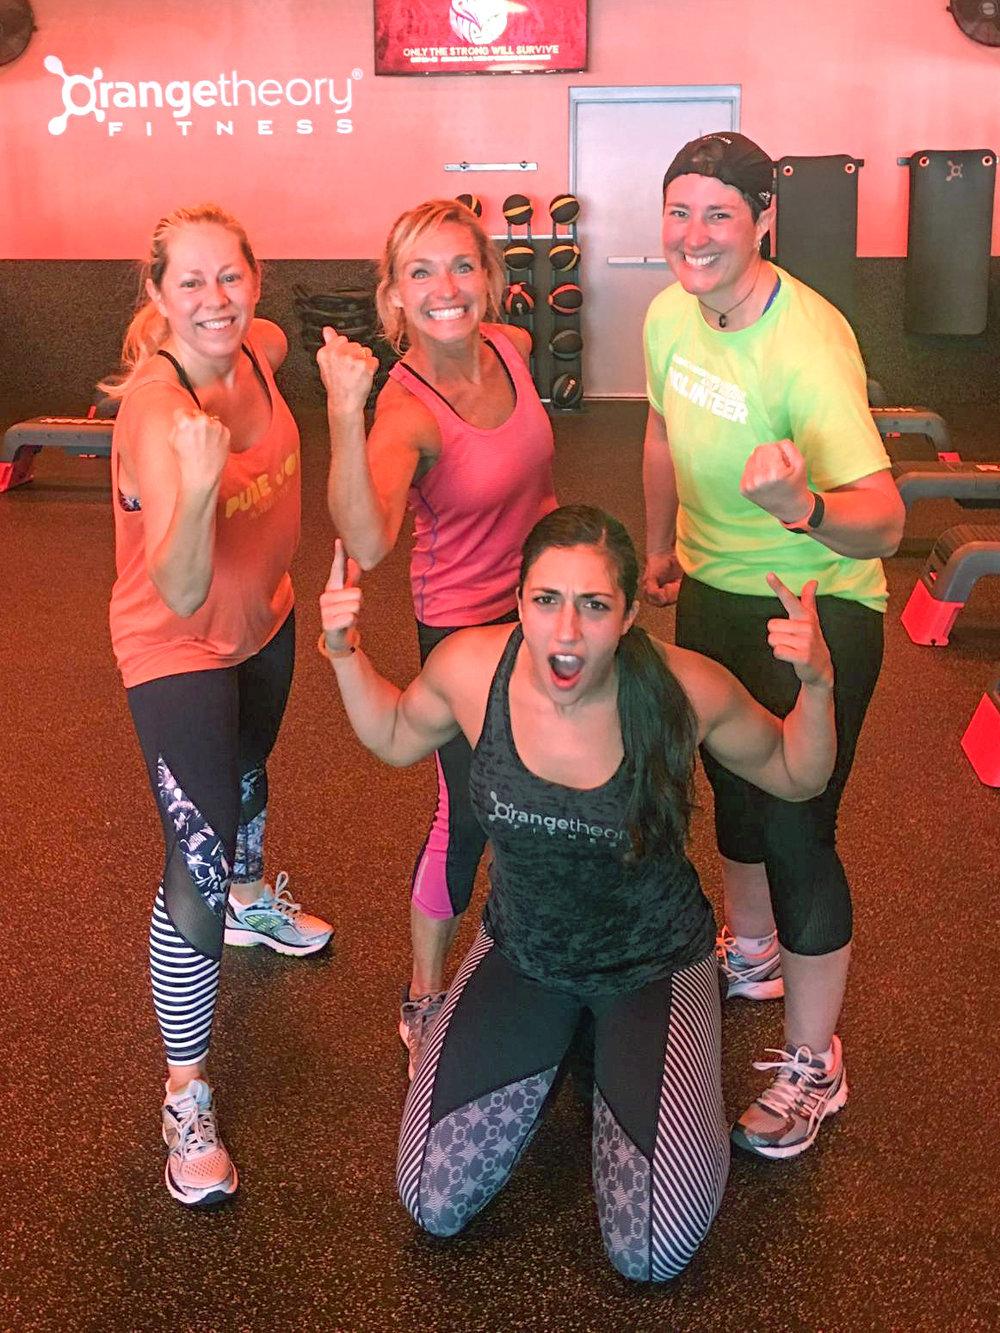 Training buddies at OrangeTheory Fitness.